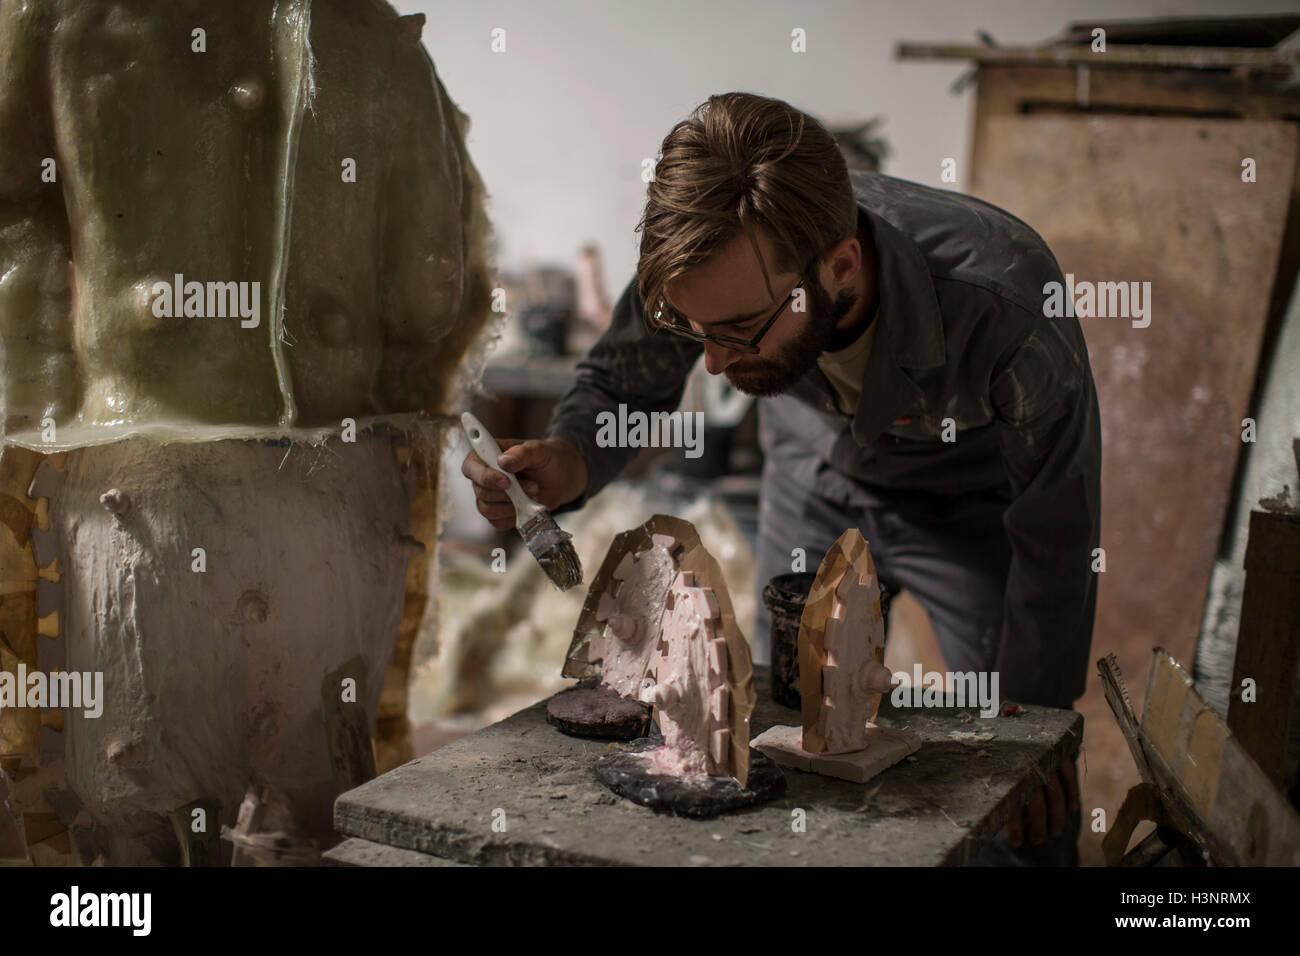 Bildhauer in Künstlerstudio Skulptur Stockbild